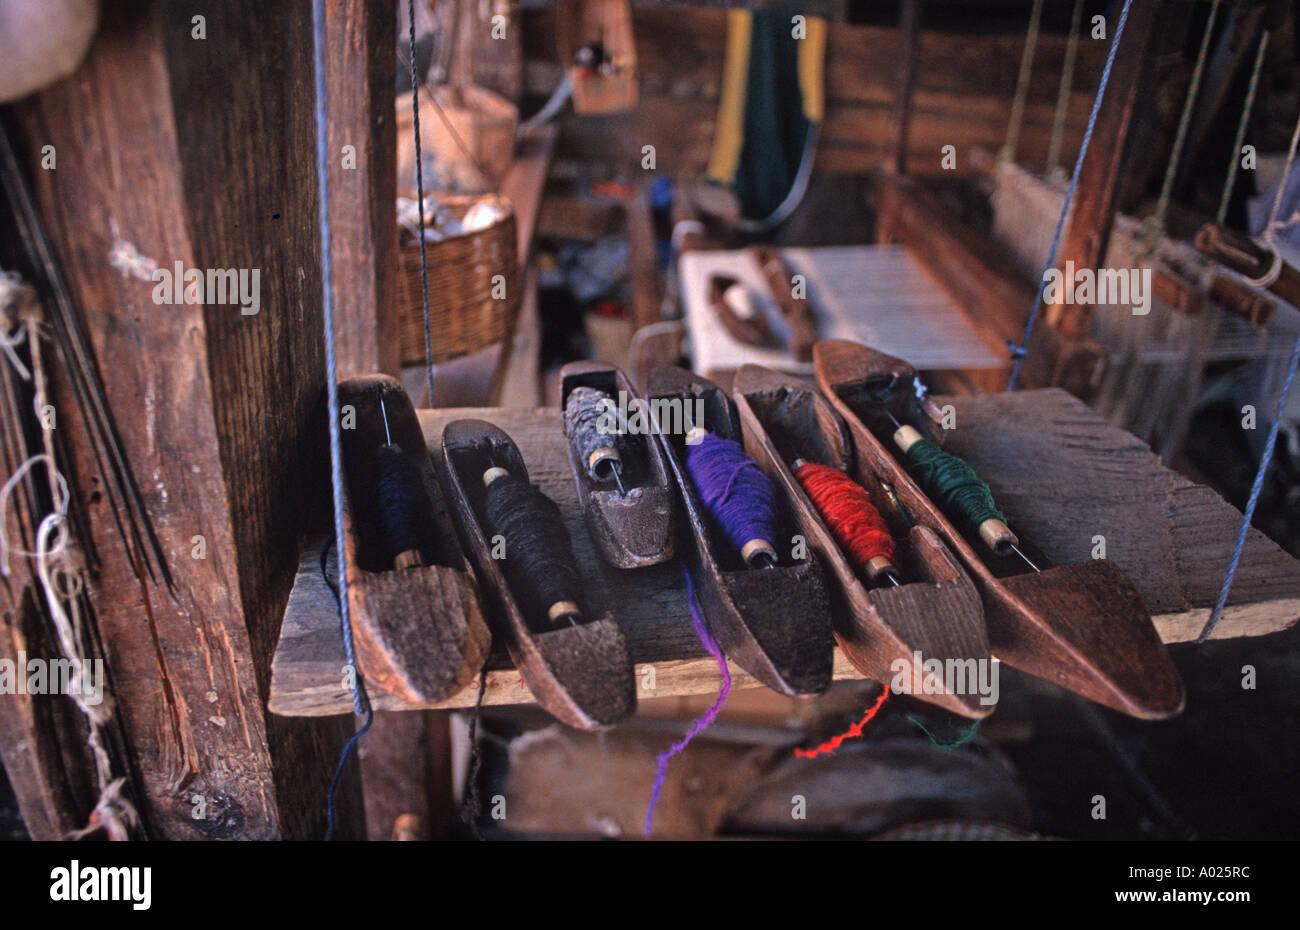 Bobbins holding colourfully dyed handspun woollen thread Sitting beside a treadle operated loom Momostenango Guatemala - Stock Image